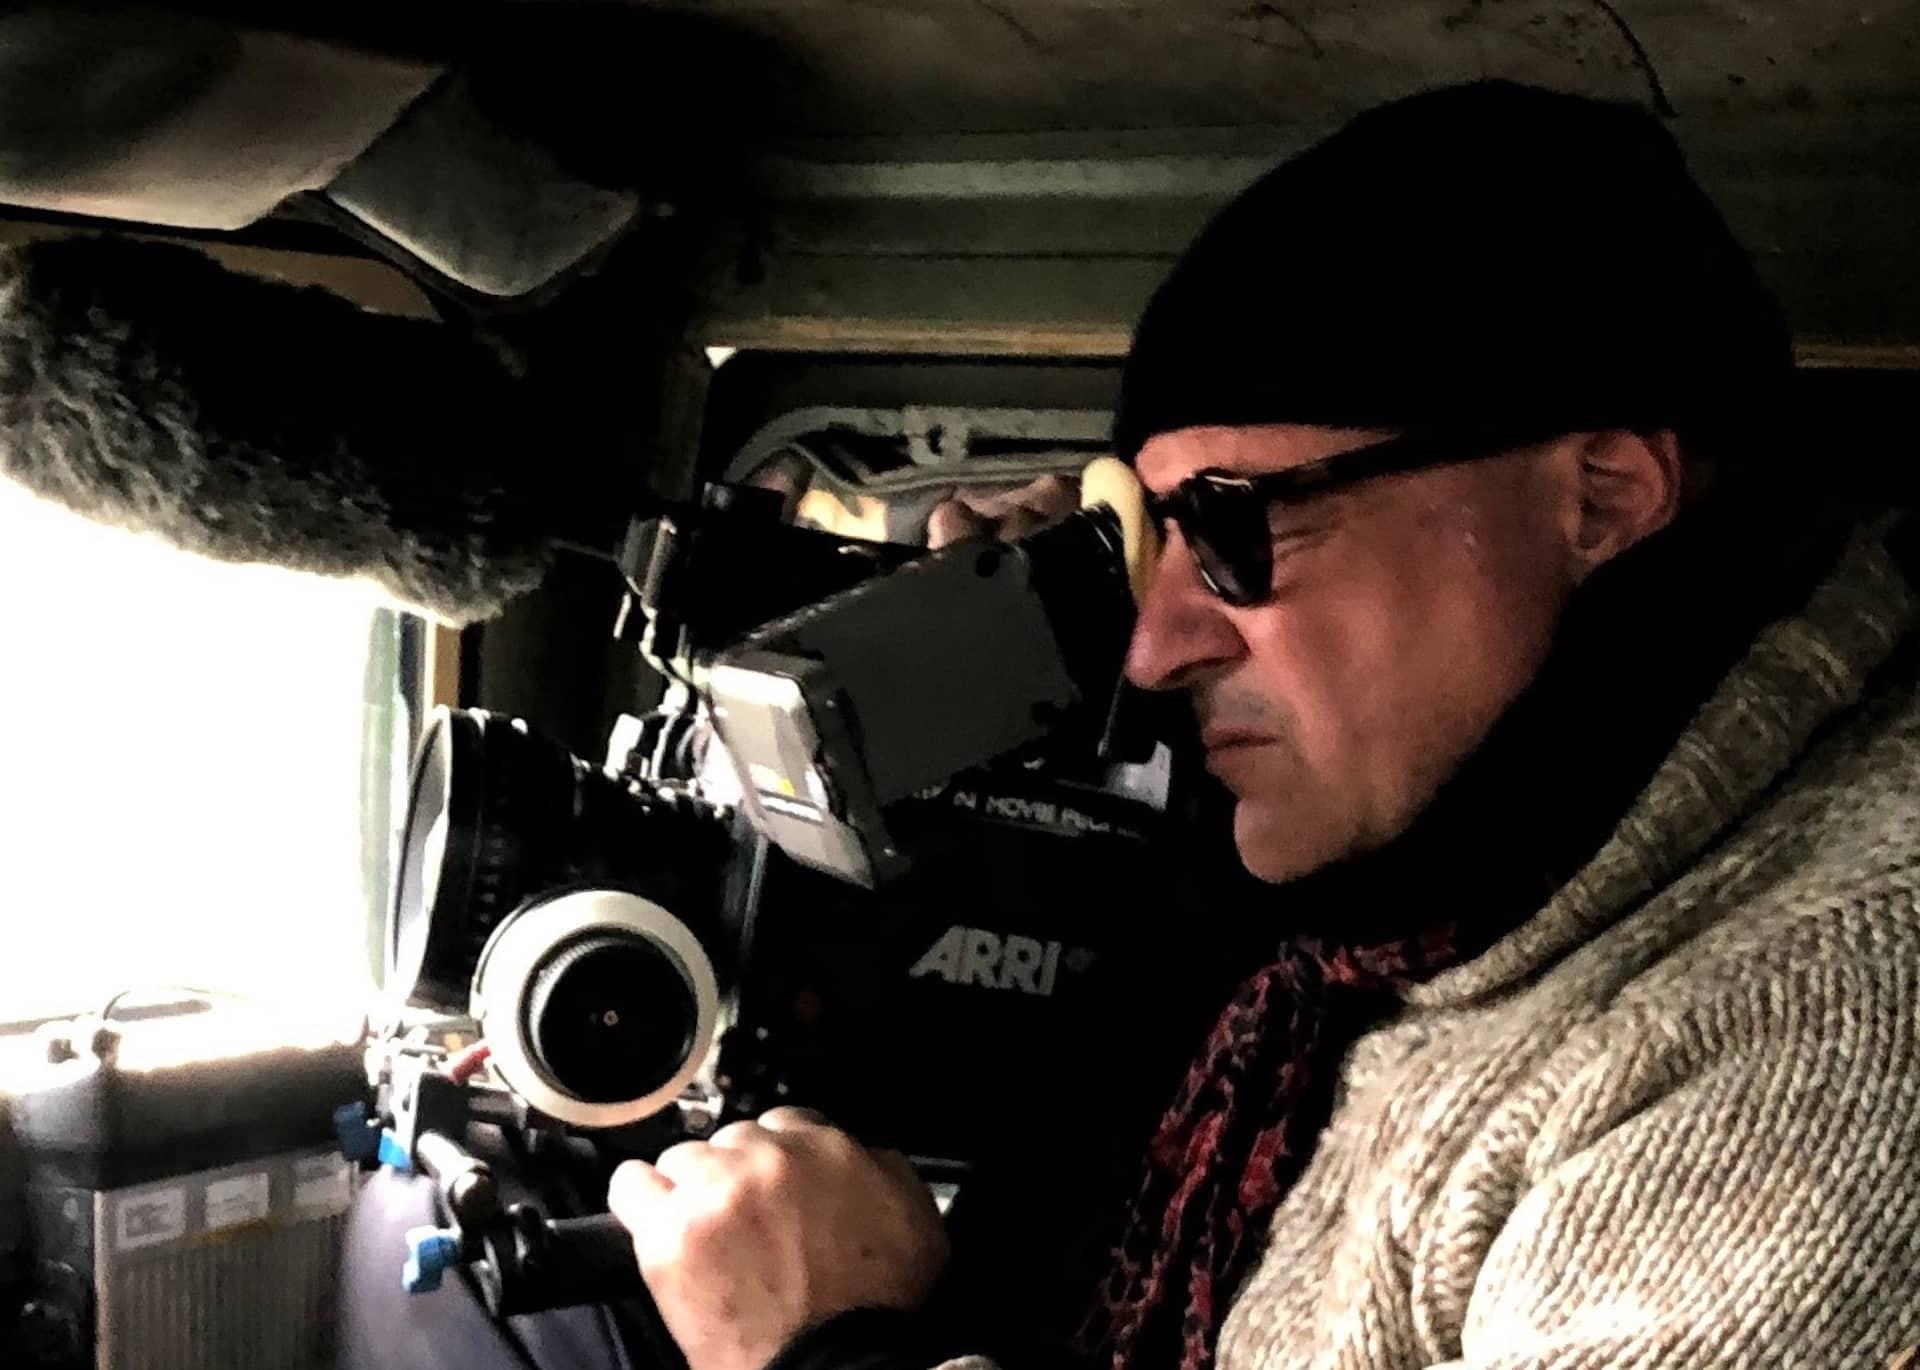 notturno Cinematographe.it